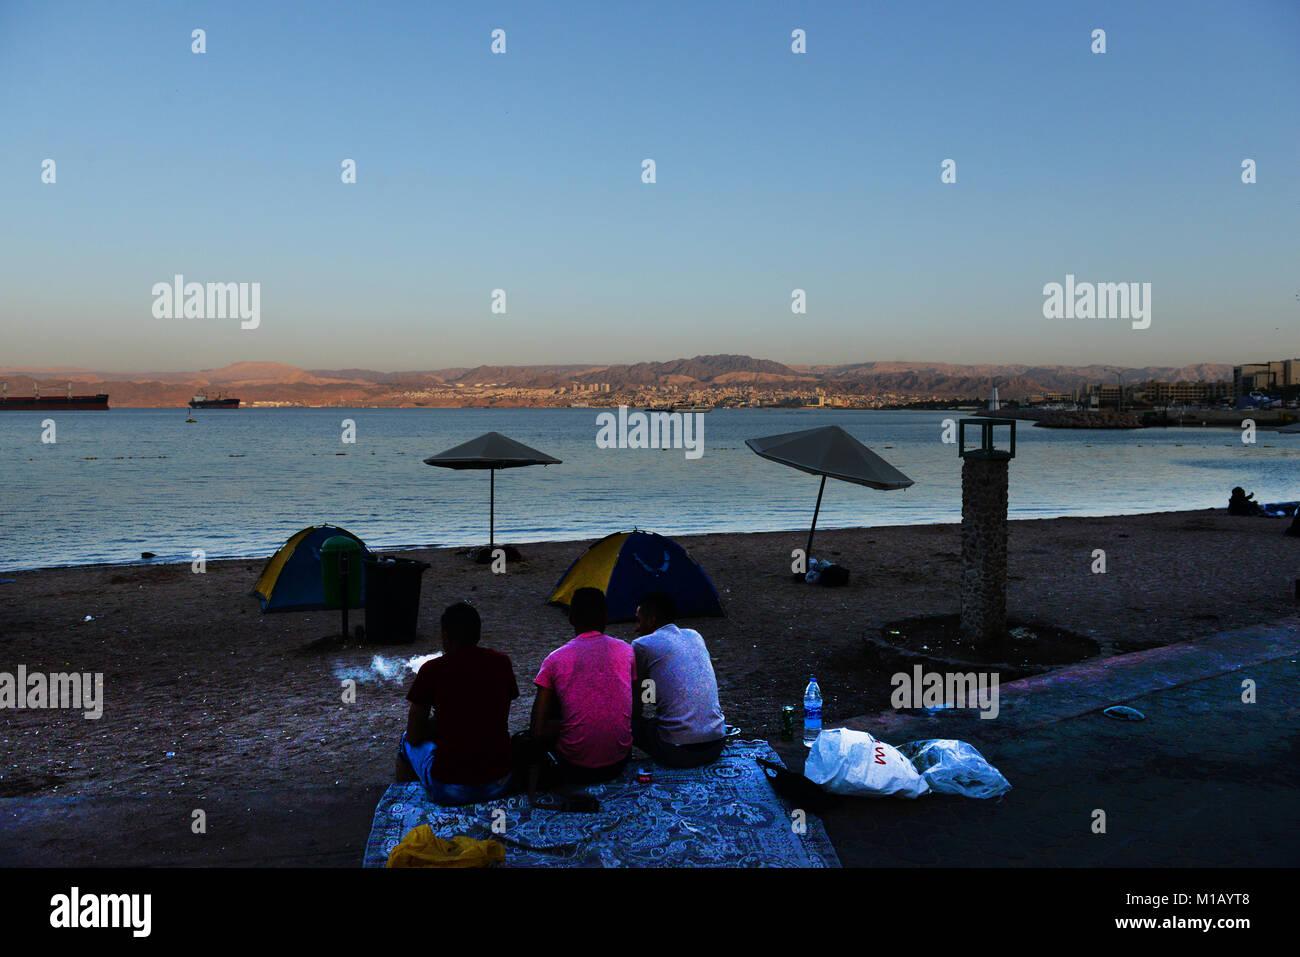 Early morning  on Al-Ghandour Beach in Aqaba, Jordan. - Stock Image